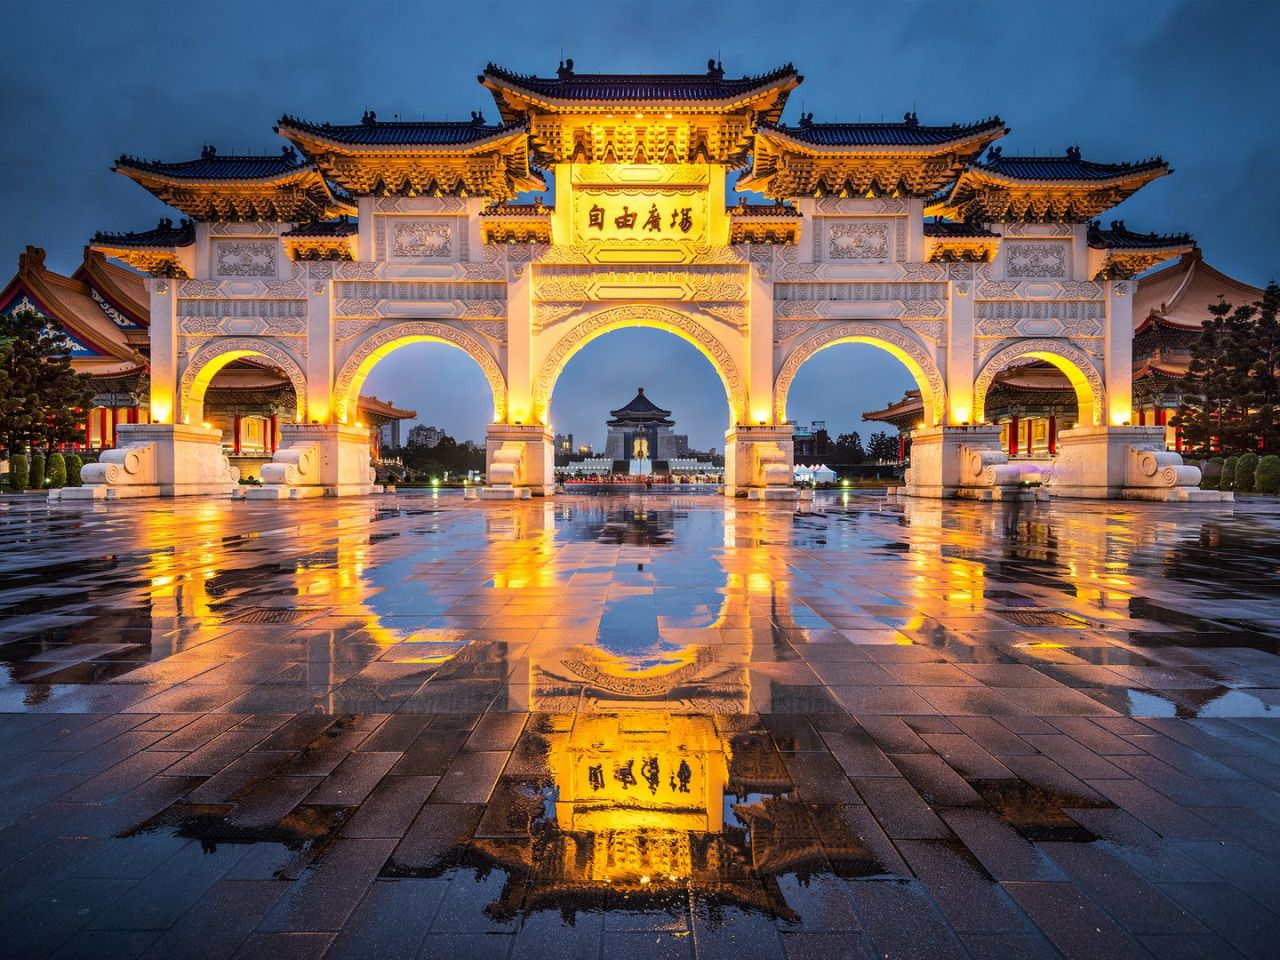 769ef62f1831090d48a842ff8d60ad0a - جاهای دیدنی شهر تایپه ، پایتخت تایوان | Taipei